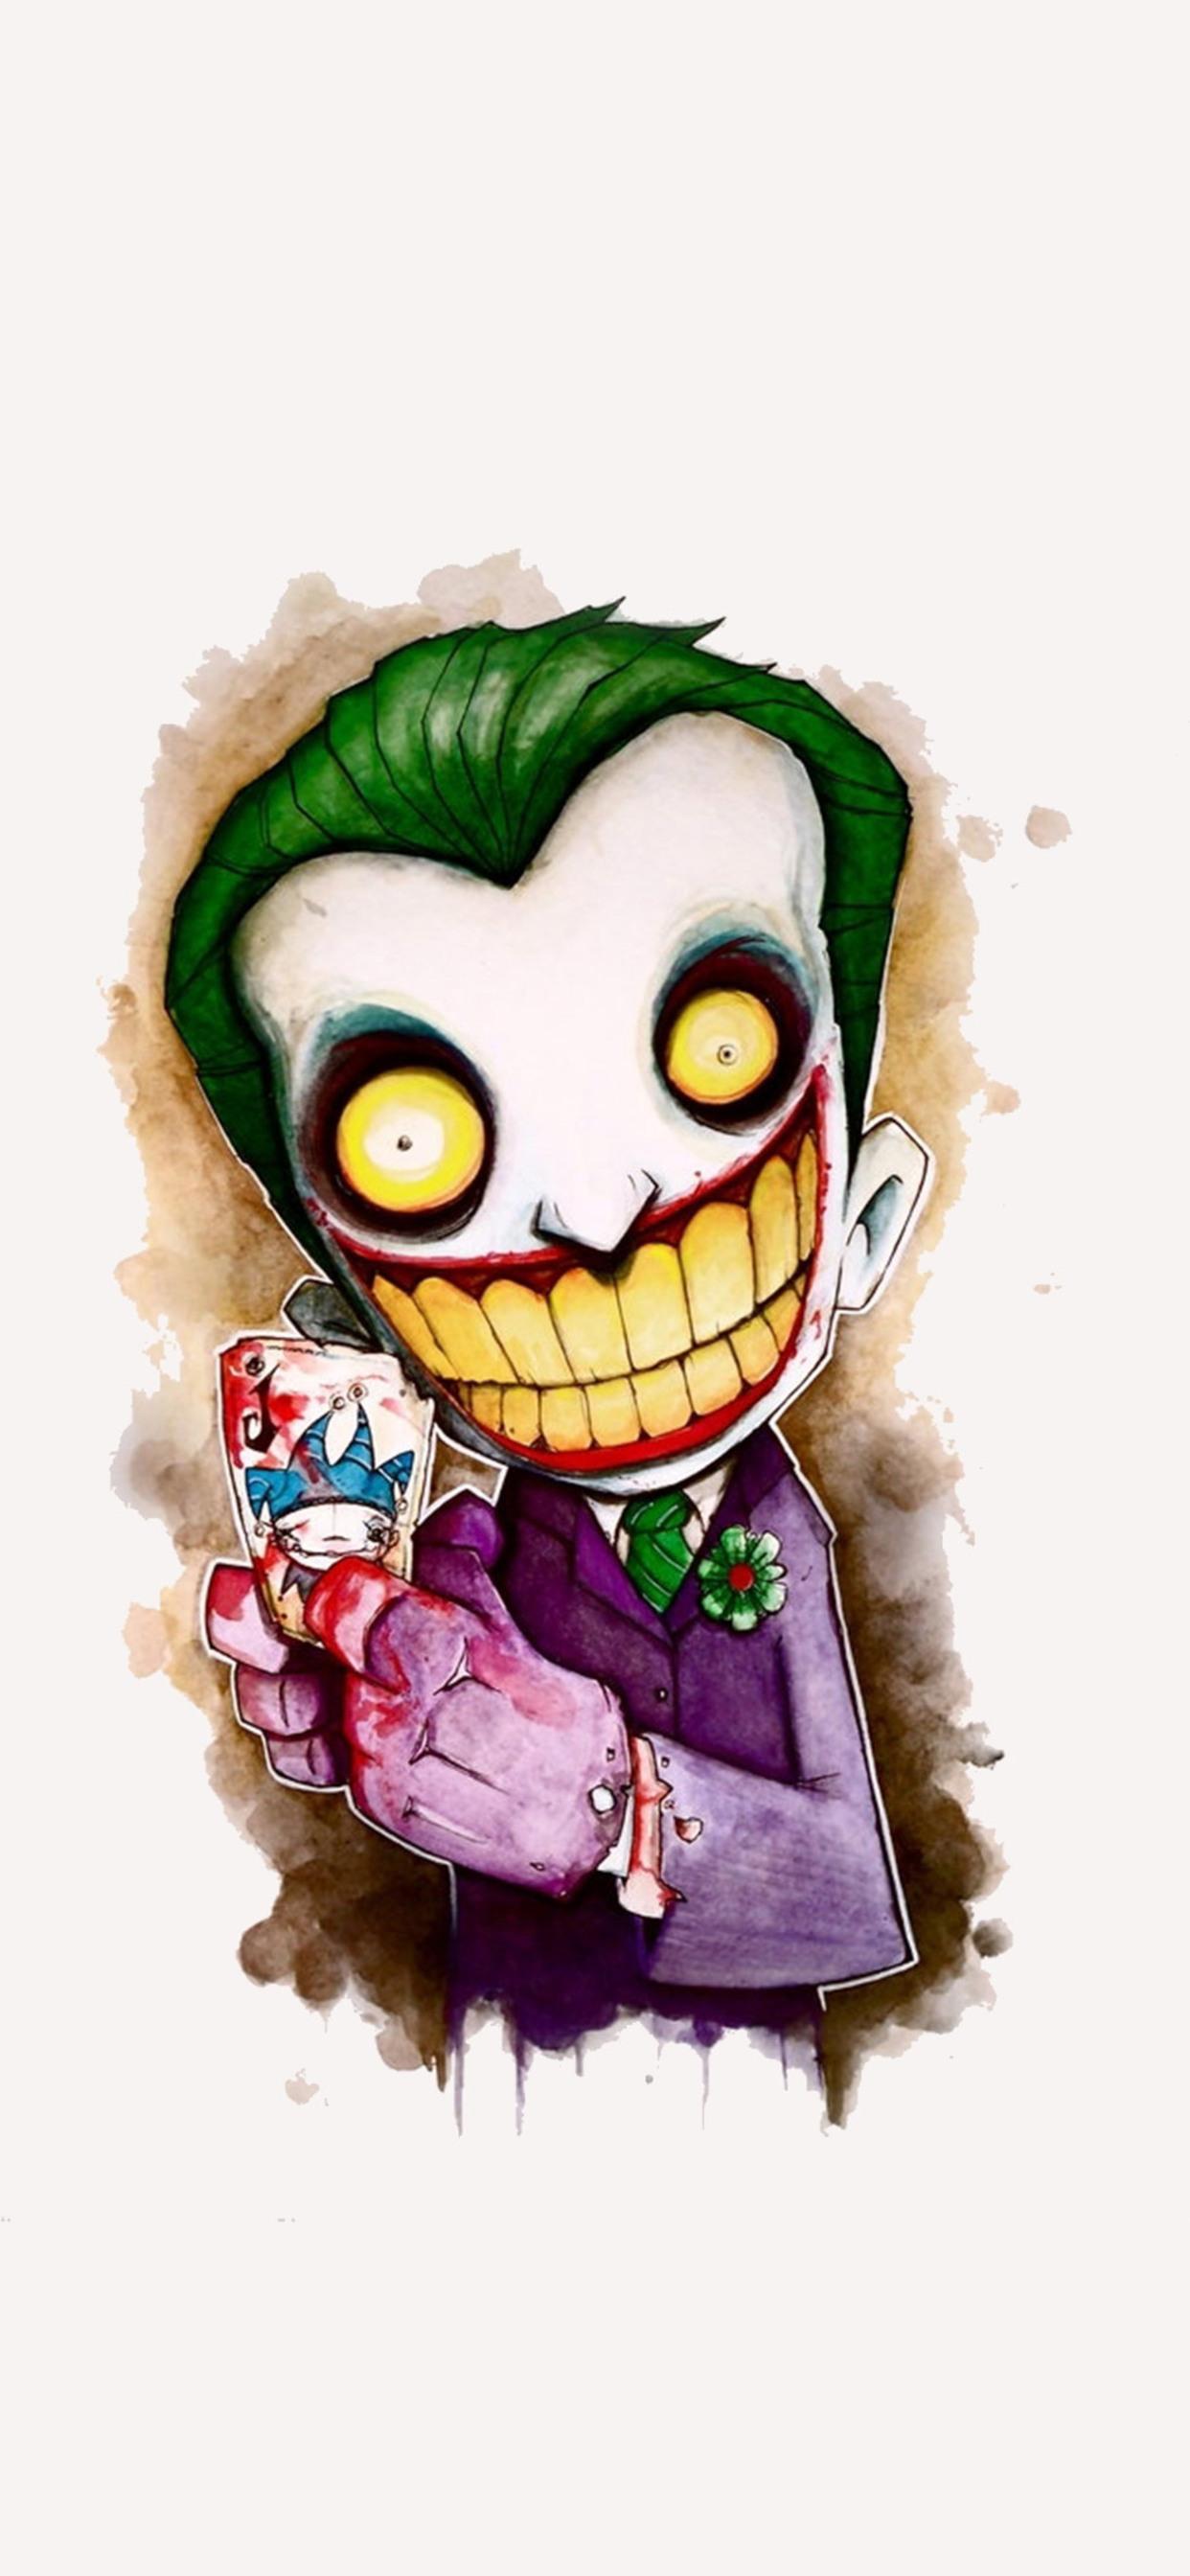 1242x2688 Joker Cartoon 4k Artwork Iphone Xs Max Hd 4k Wallpapers